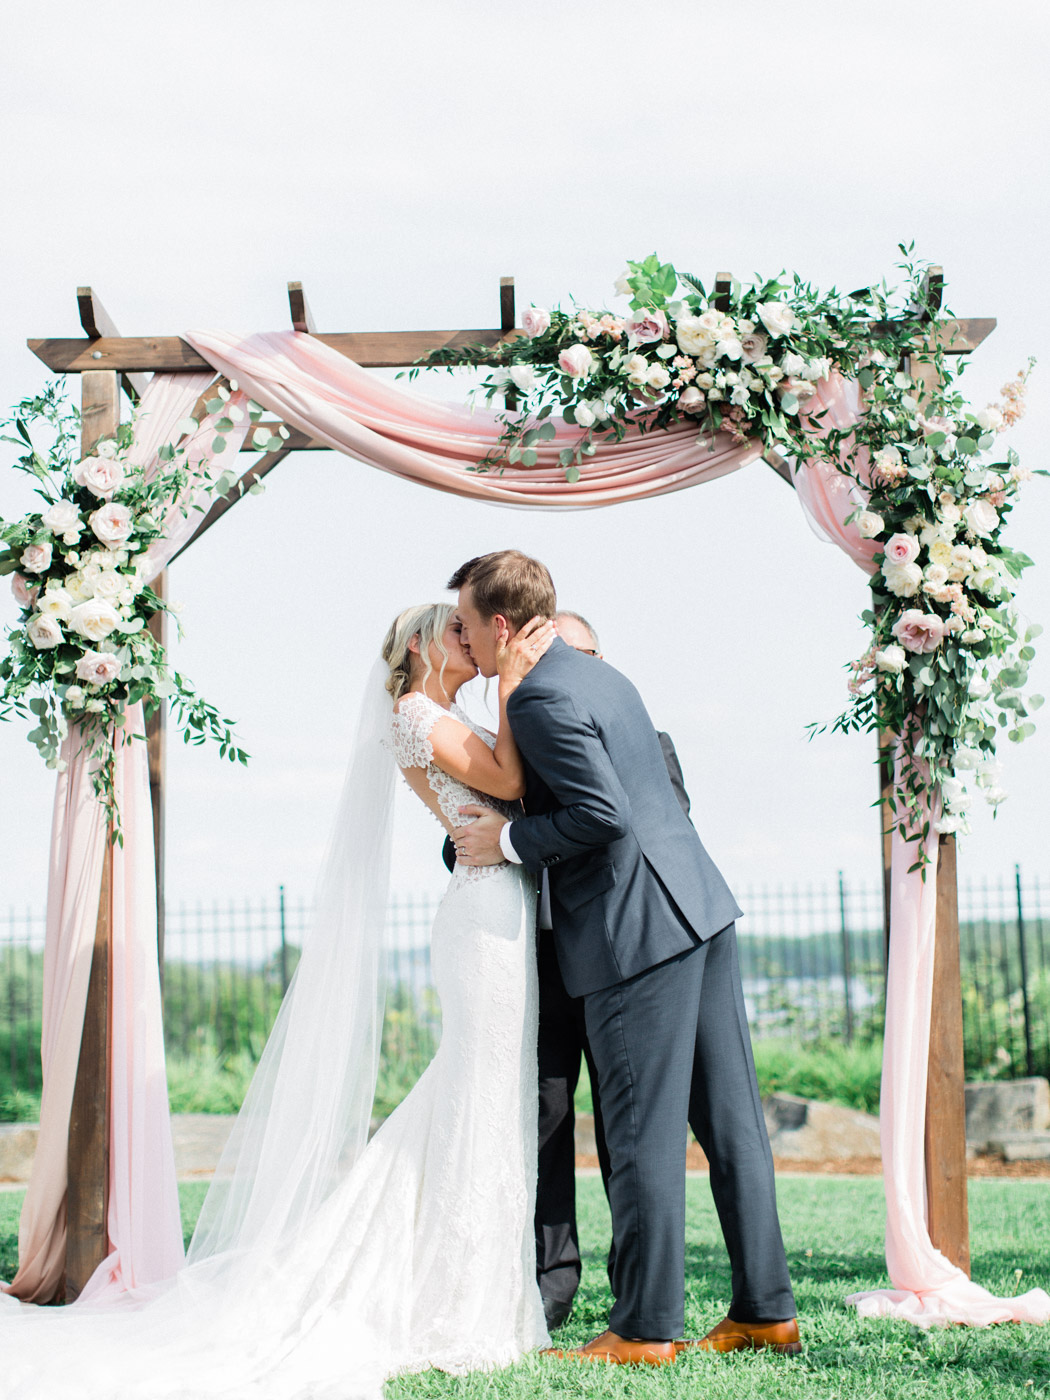 Toronto-Muskoka-wedding-photographer-summery-fun-documentary-the-marriott-rosseau87.jpg